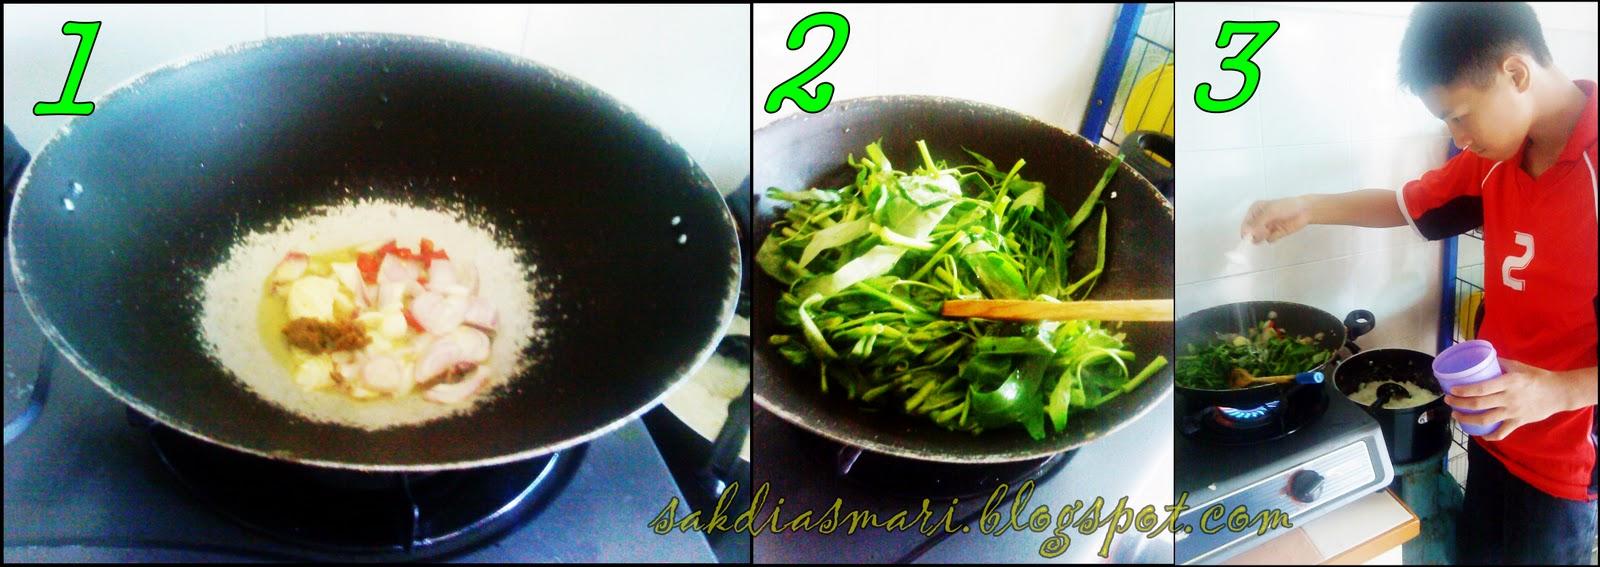 Image Result For Resepi Ayam Goreng Cornflakes